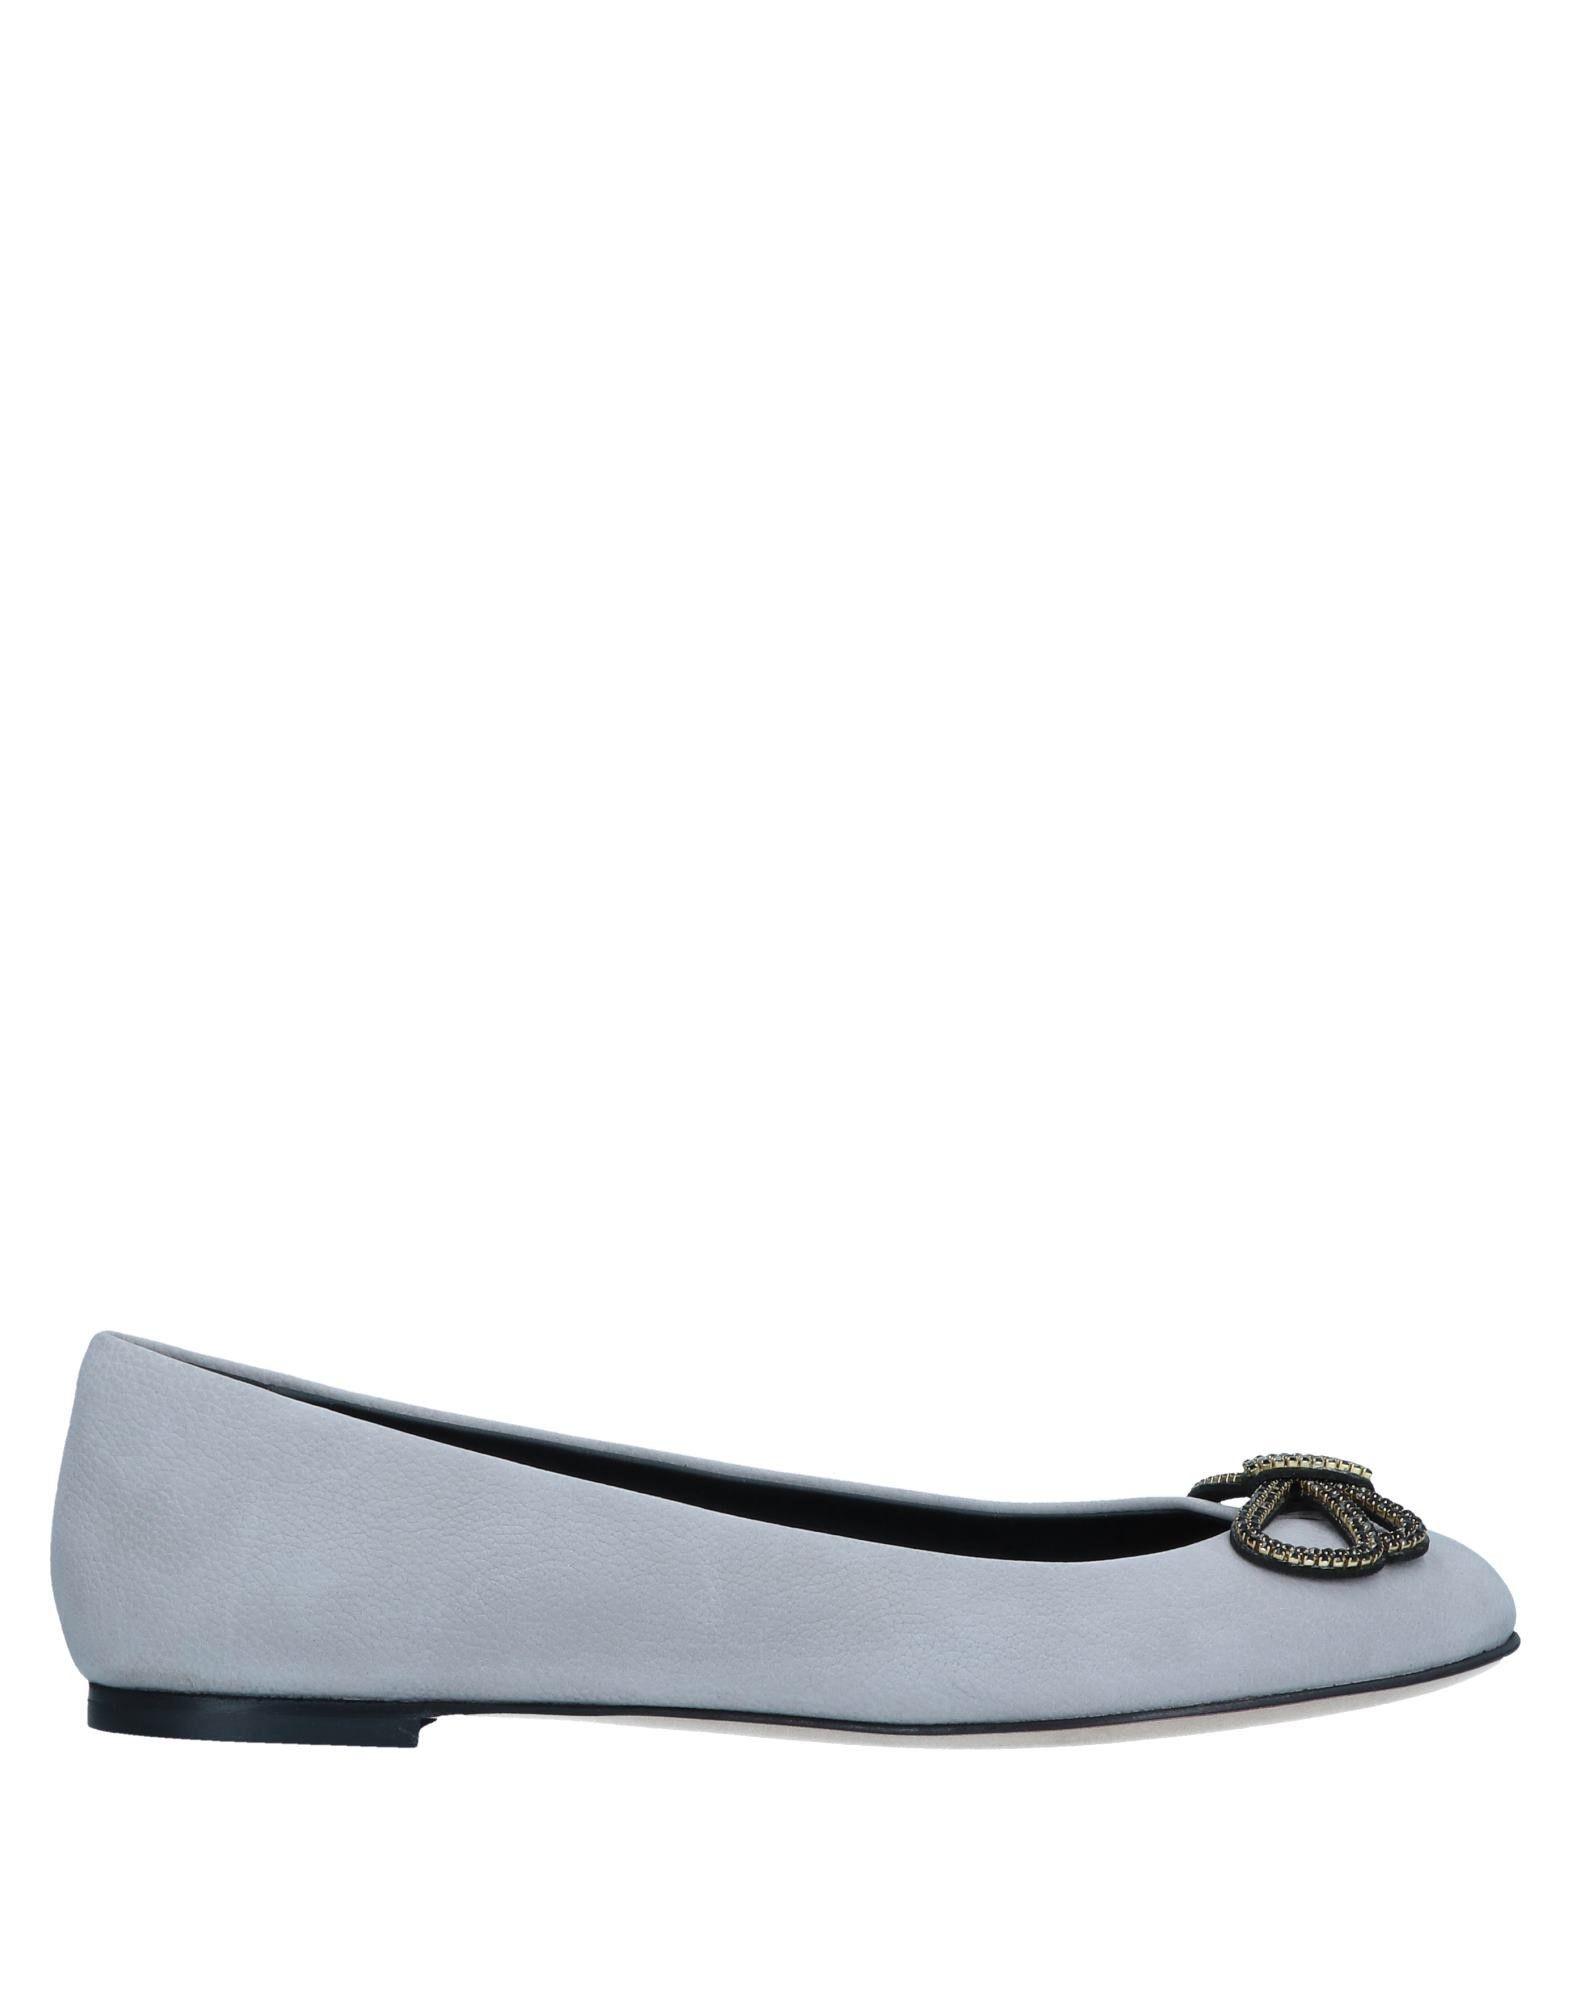 Rabatt Schuhe Giuseppe Zanotti Ballerinas Damen  11544709AQ